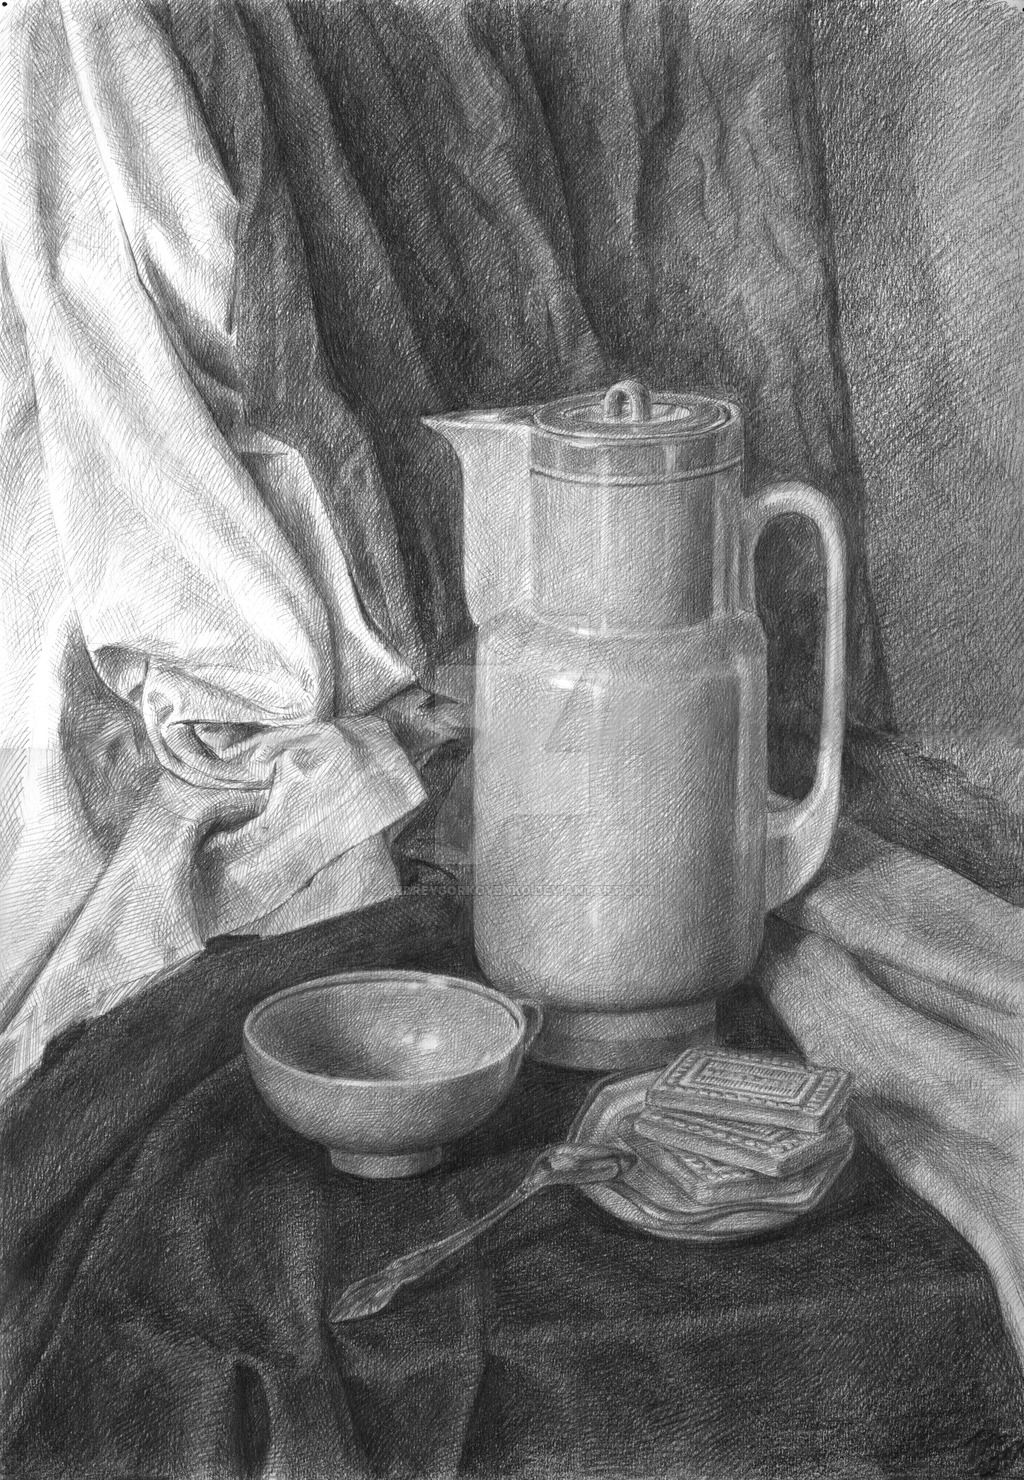 Фото Натюрморт, рисунок, основы рисование, на заказ